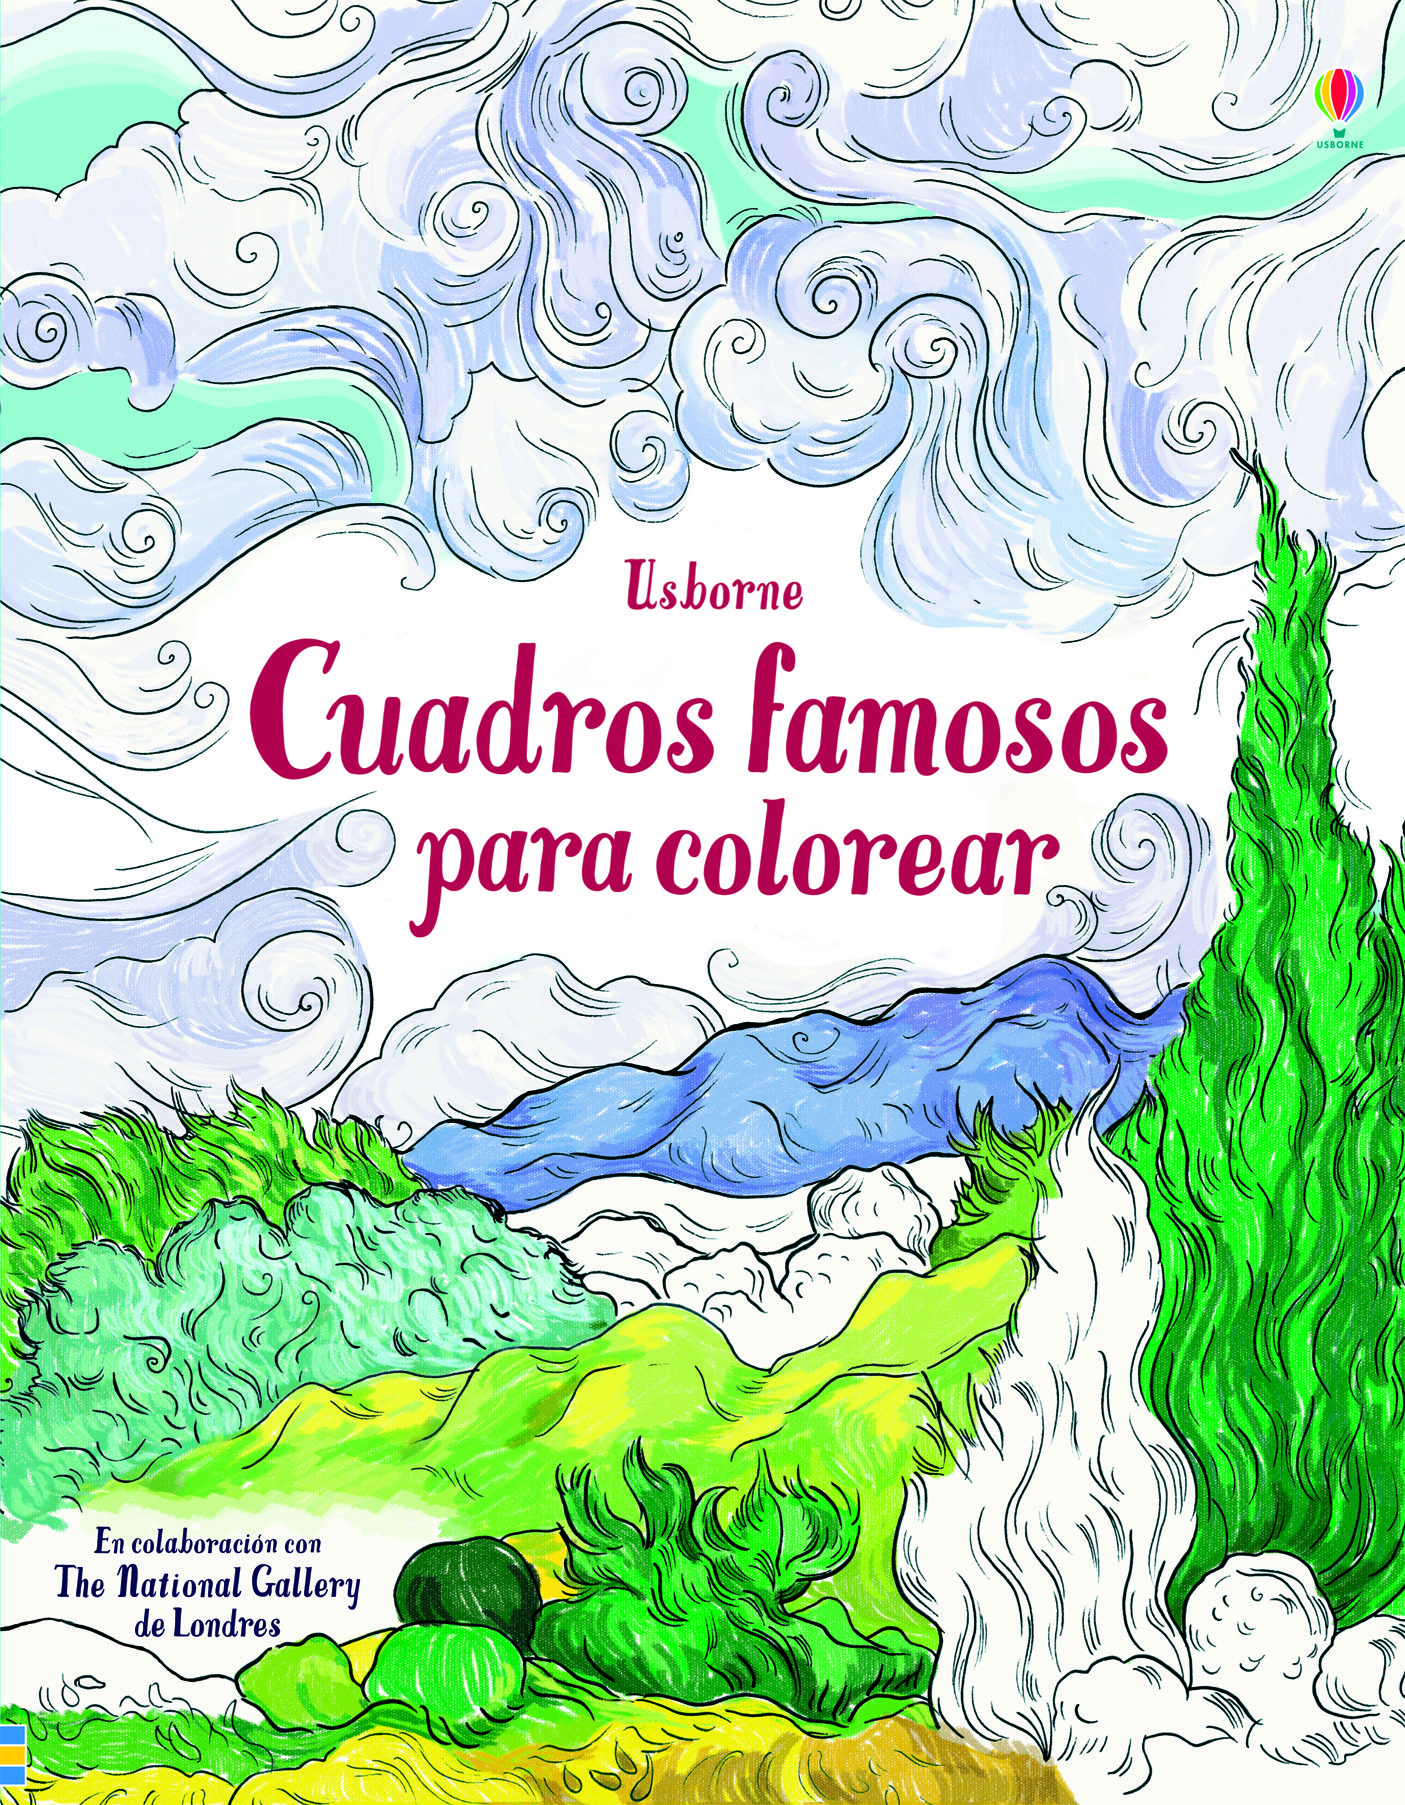 CUADROS FAMOSOS PARA COLOREAR   SUSAN MEREDITH   Comprar libro ...